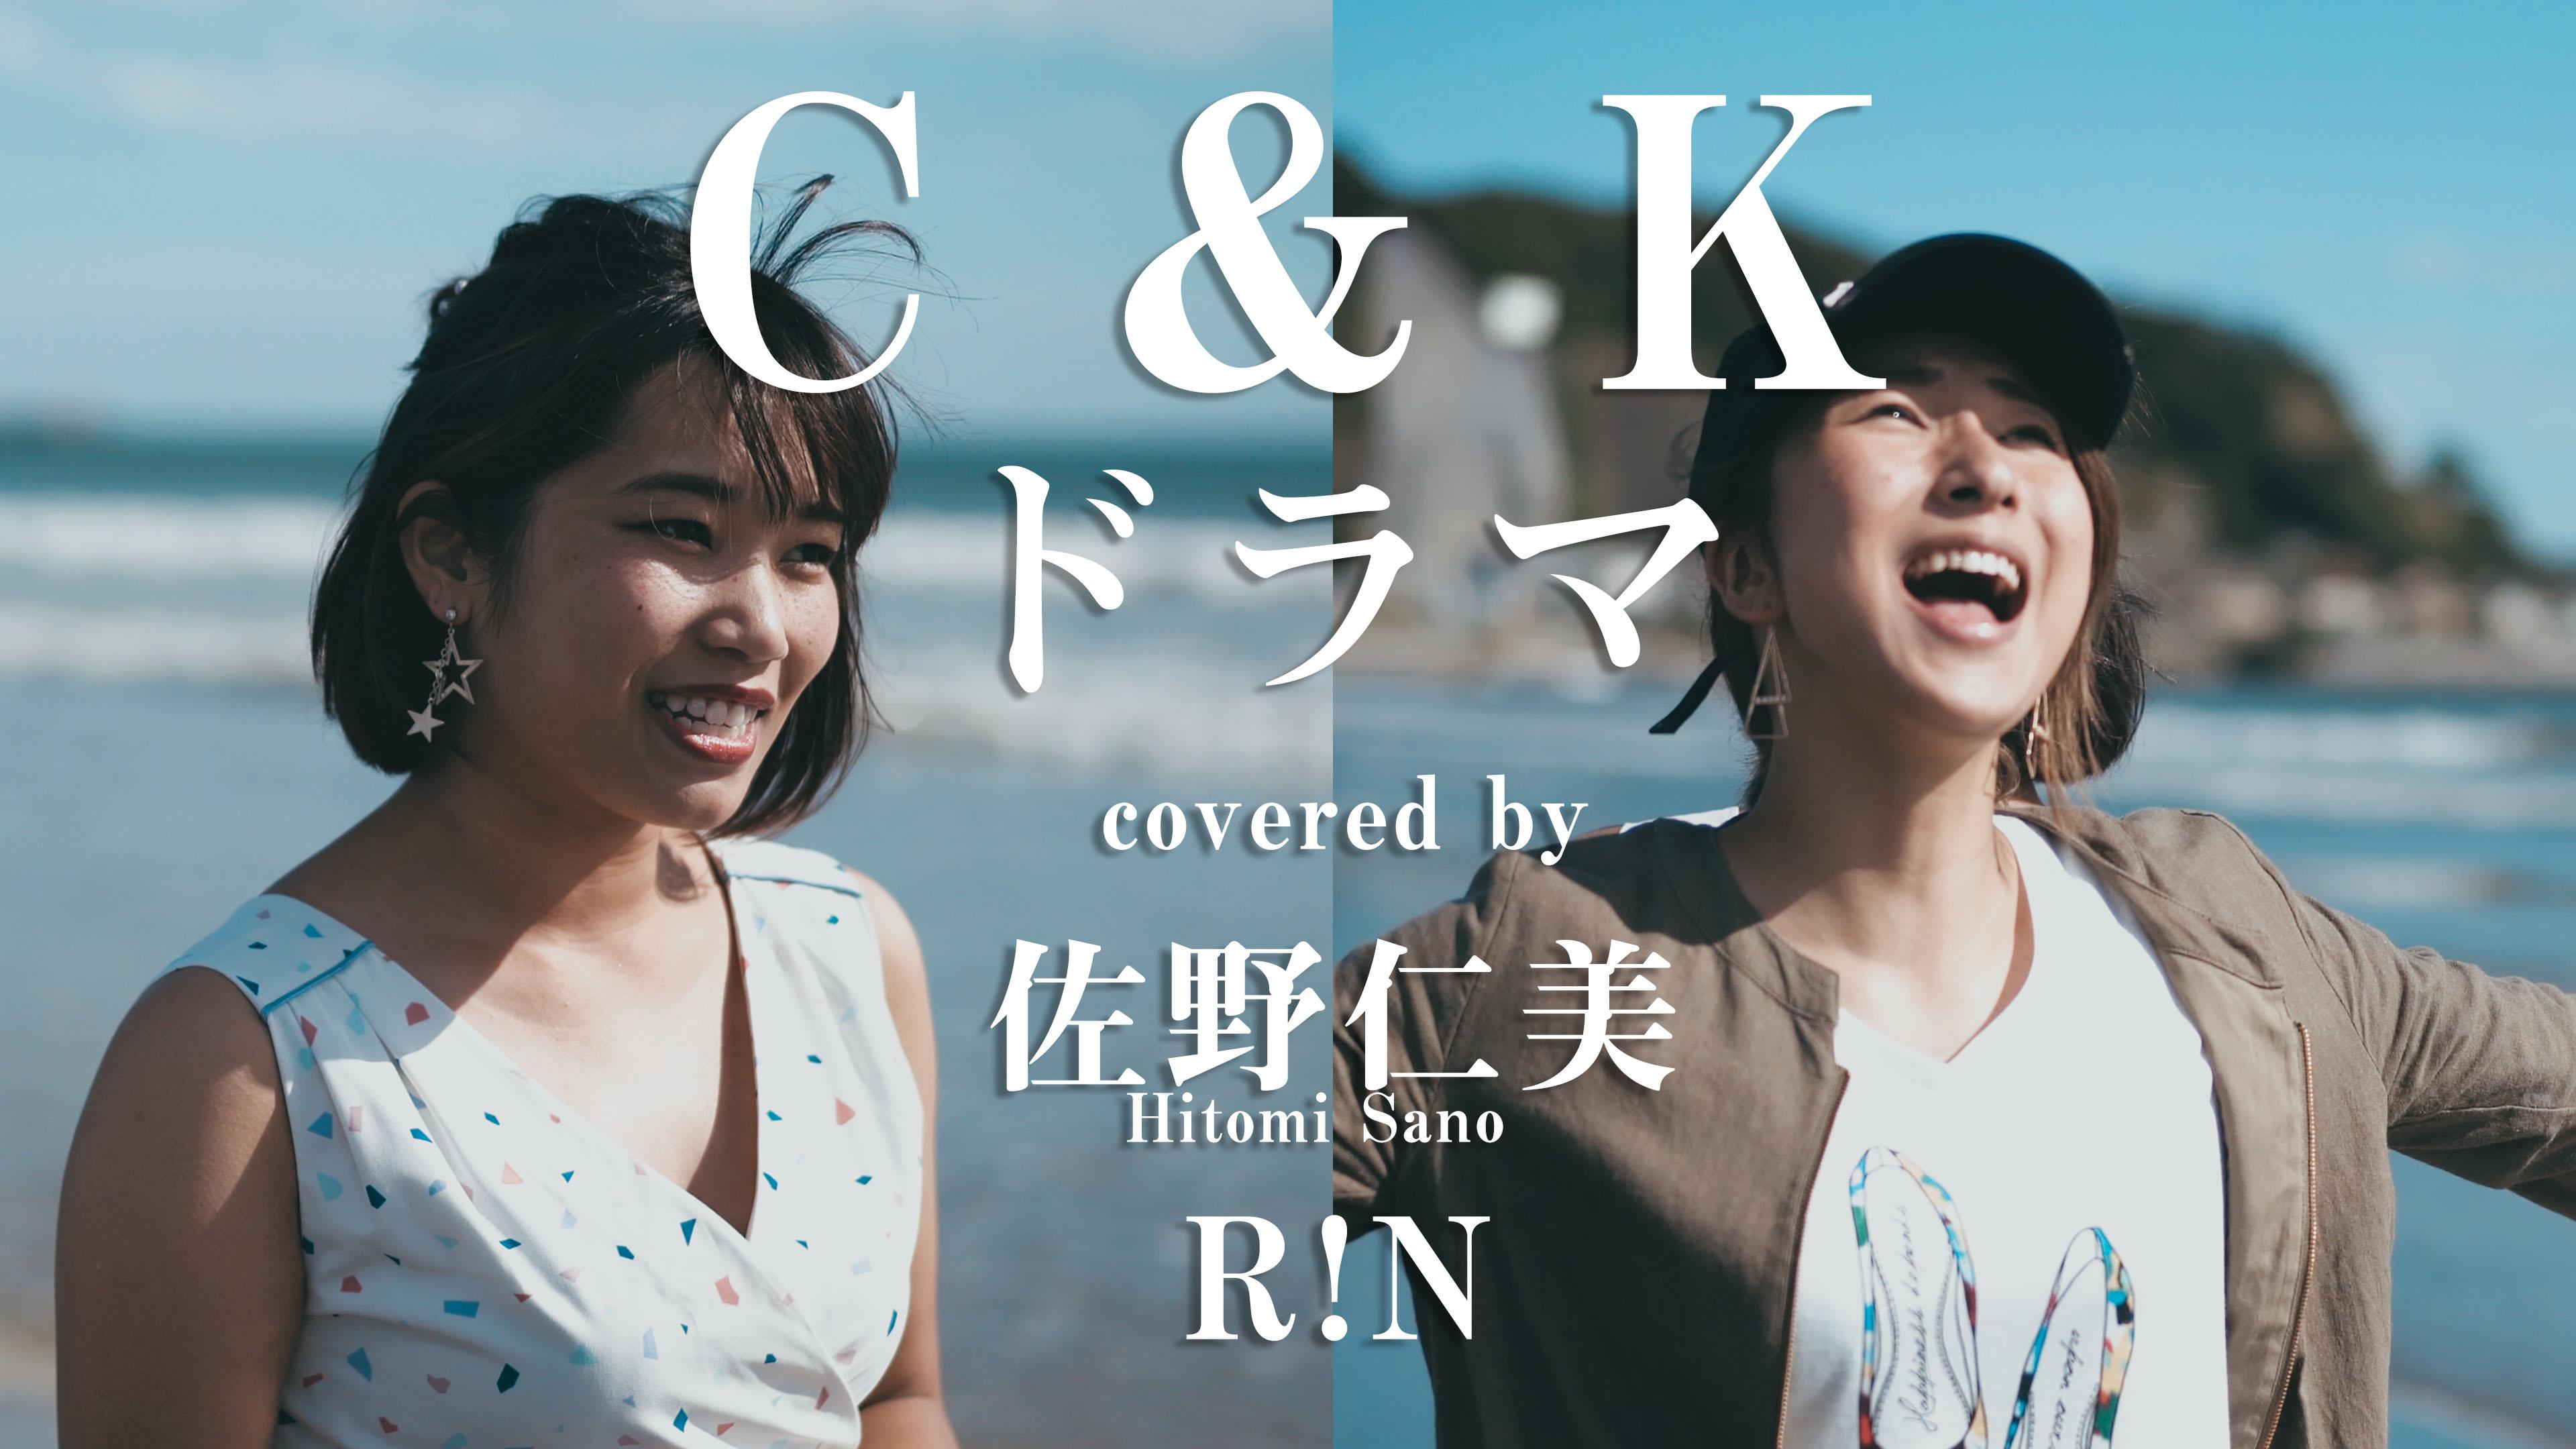 C&K ドラマ covered by 佐野仁美 & R!N